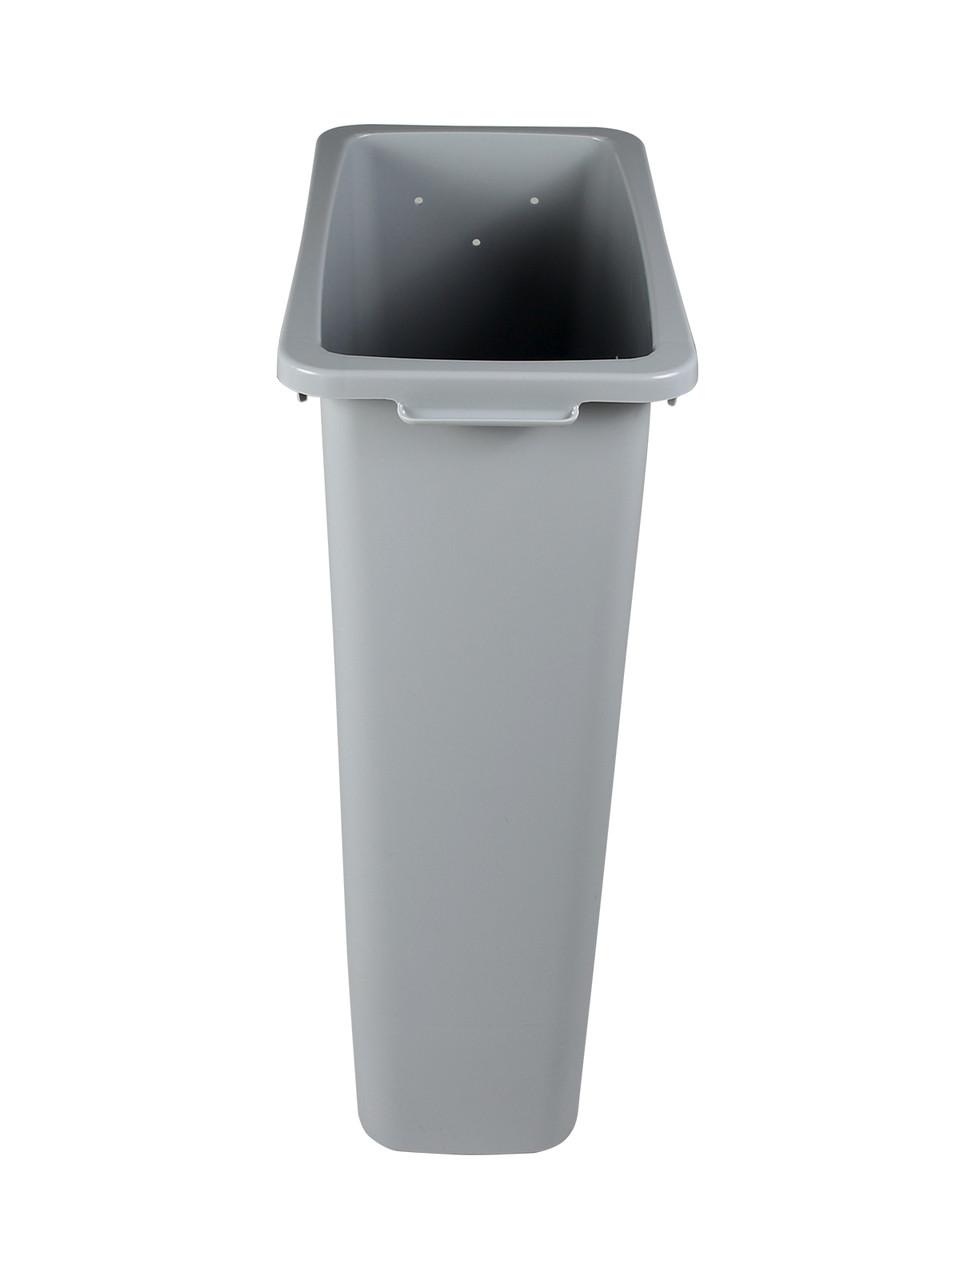 20 Gallon Skinny Plastic Home & Office Trash Can Gray